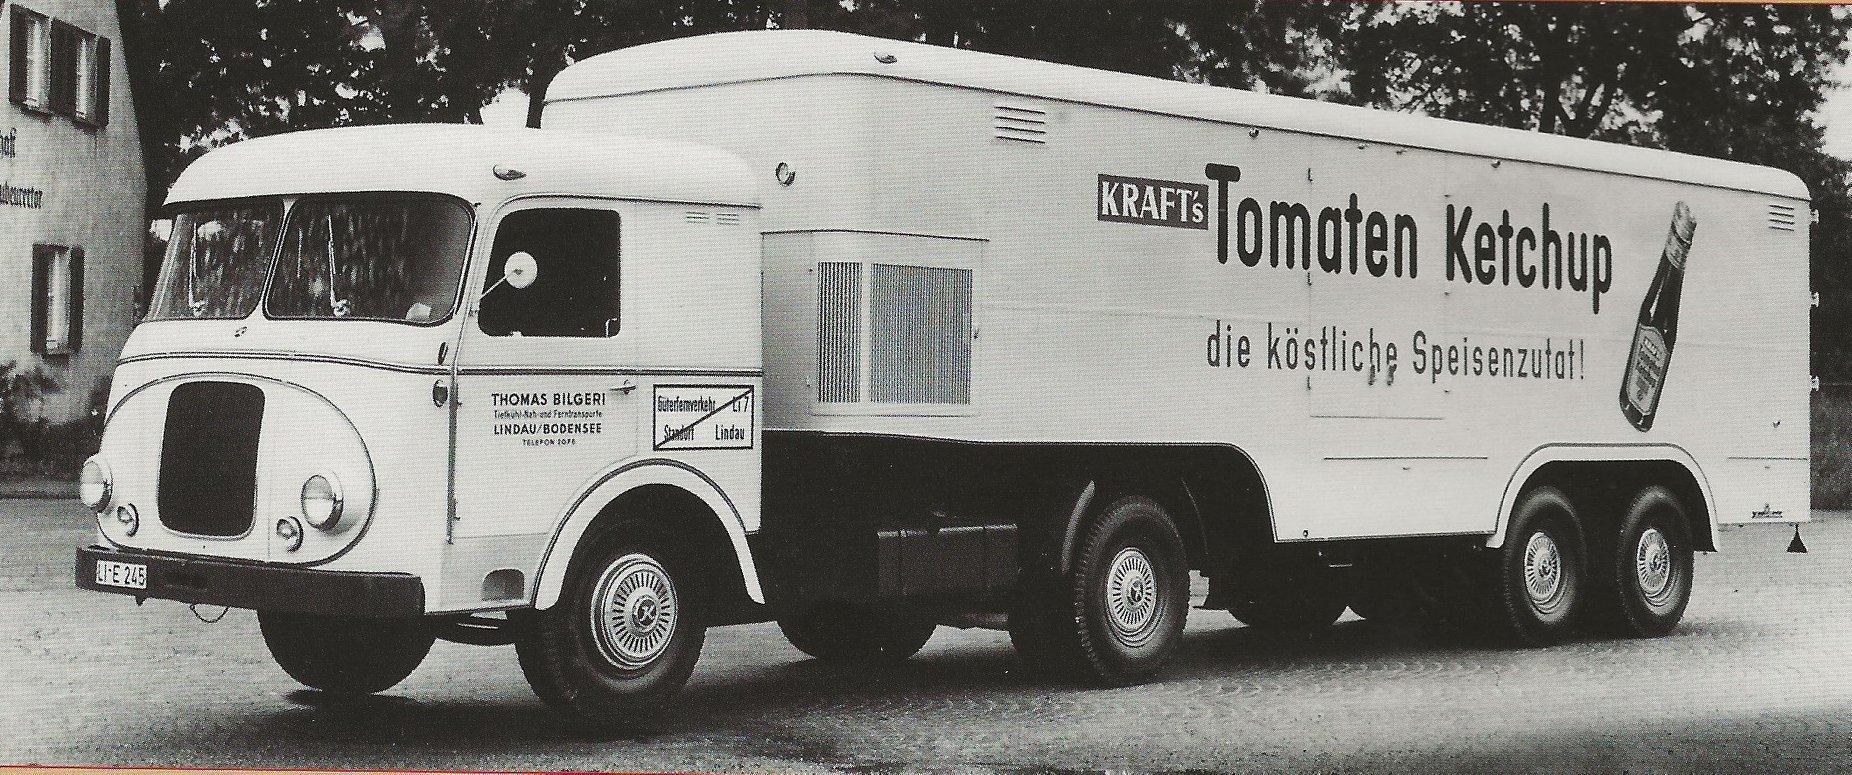 Krupp--Buffel--S-70-BF--met-Kassbohrer-